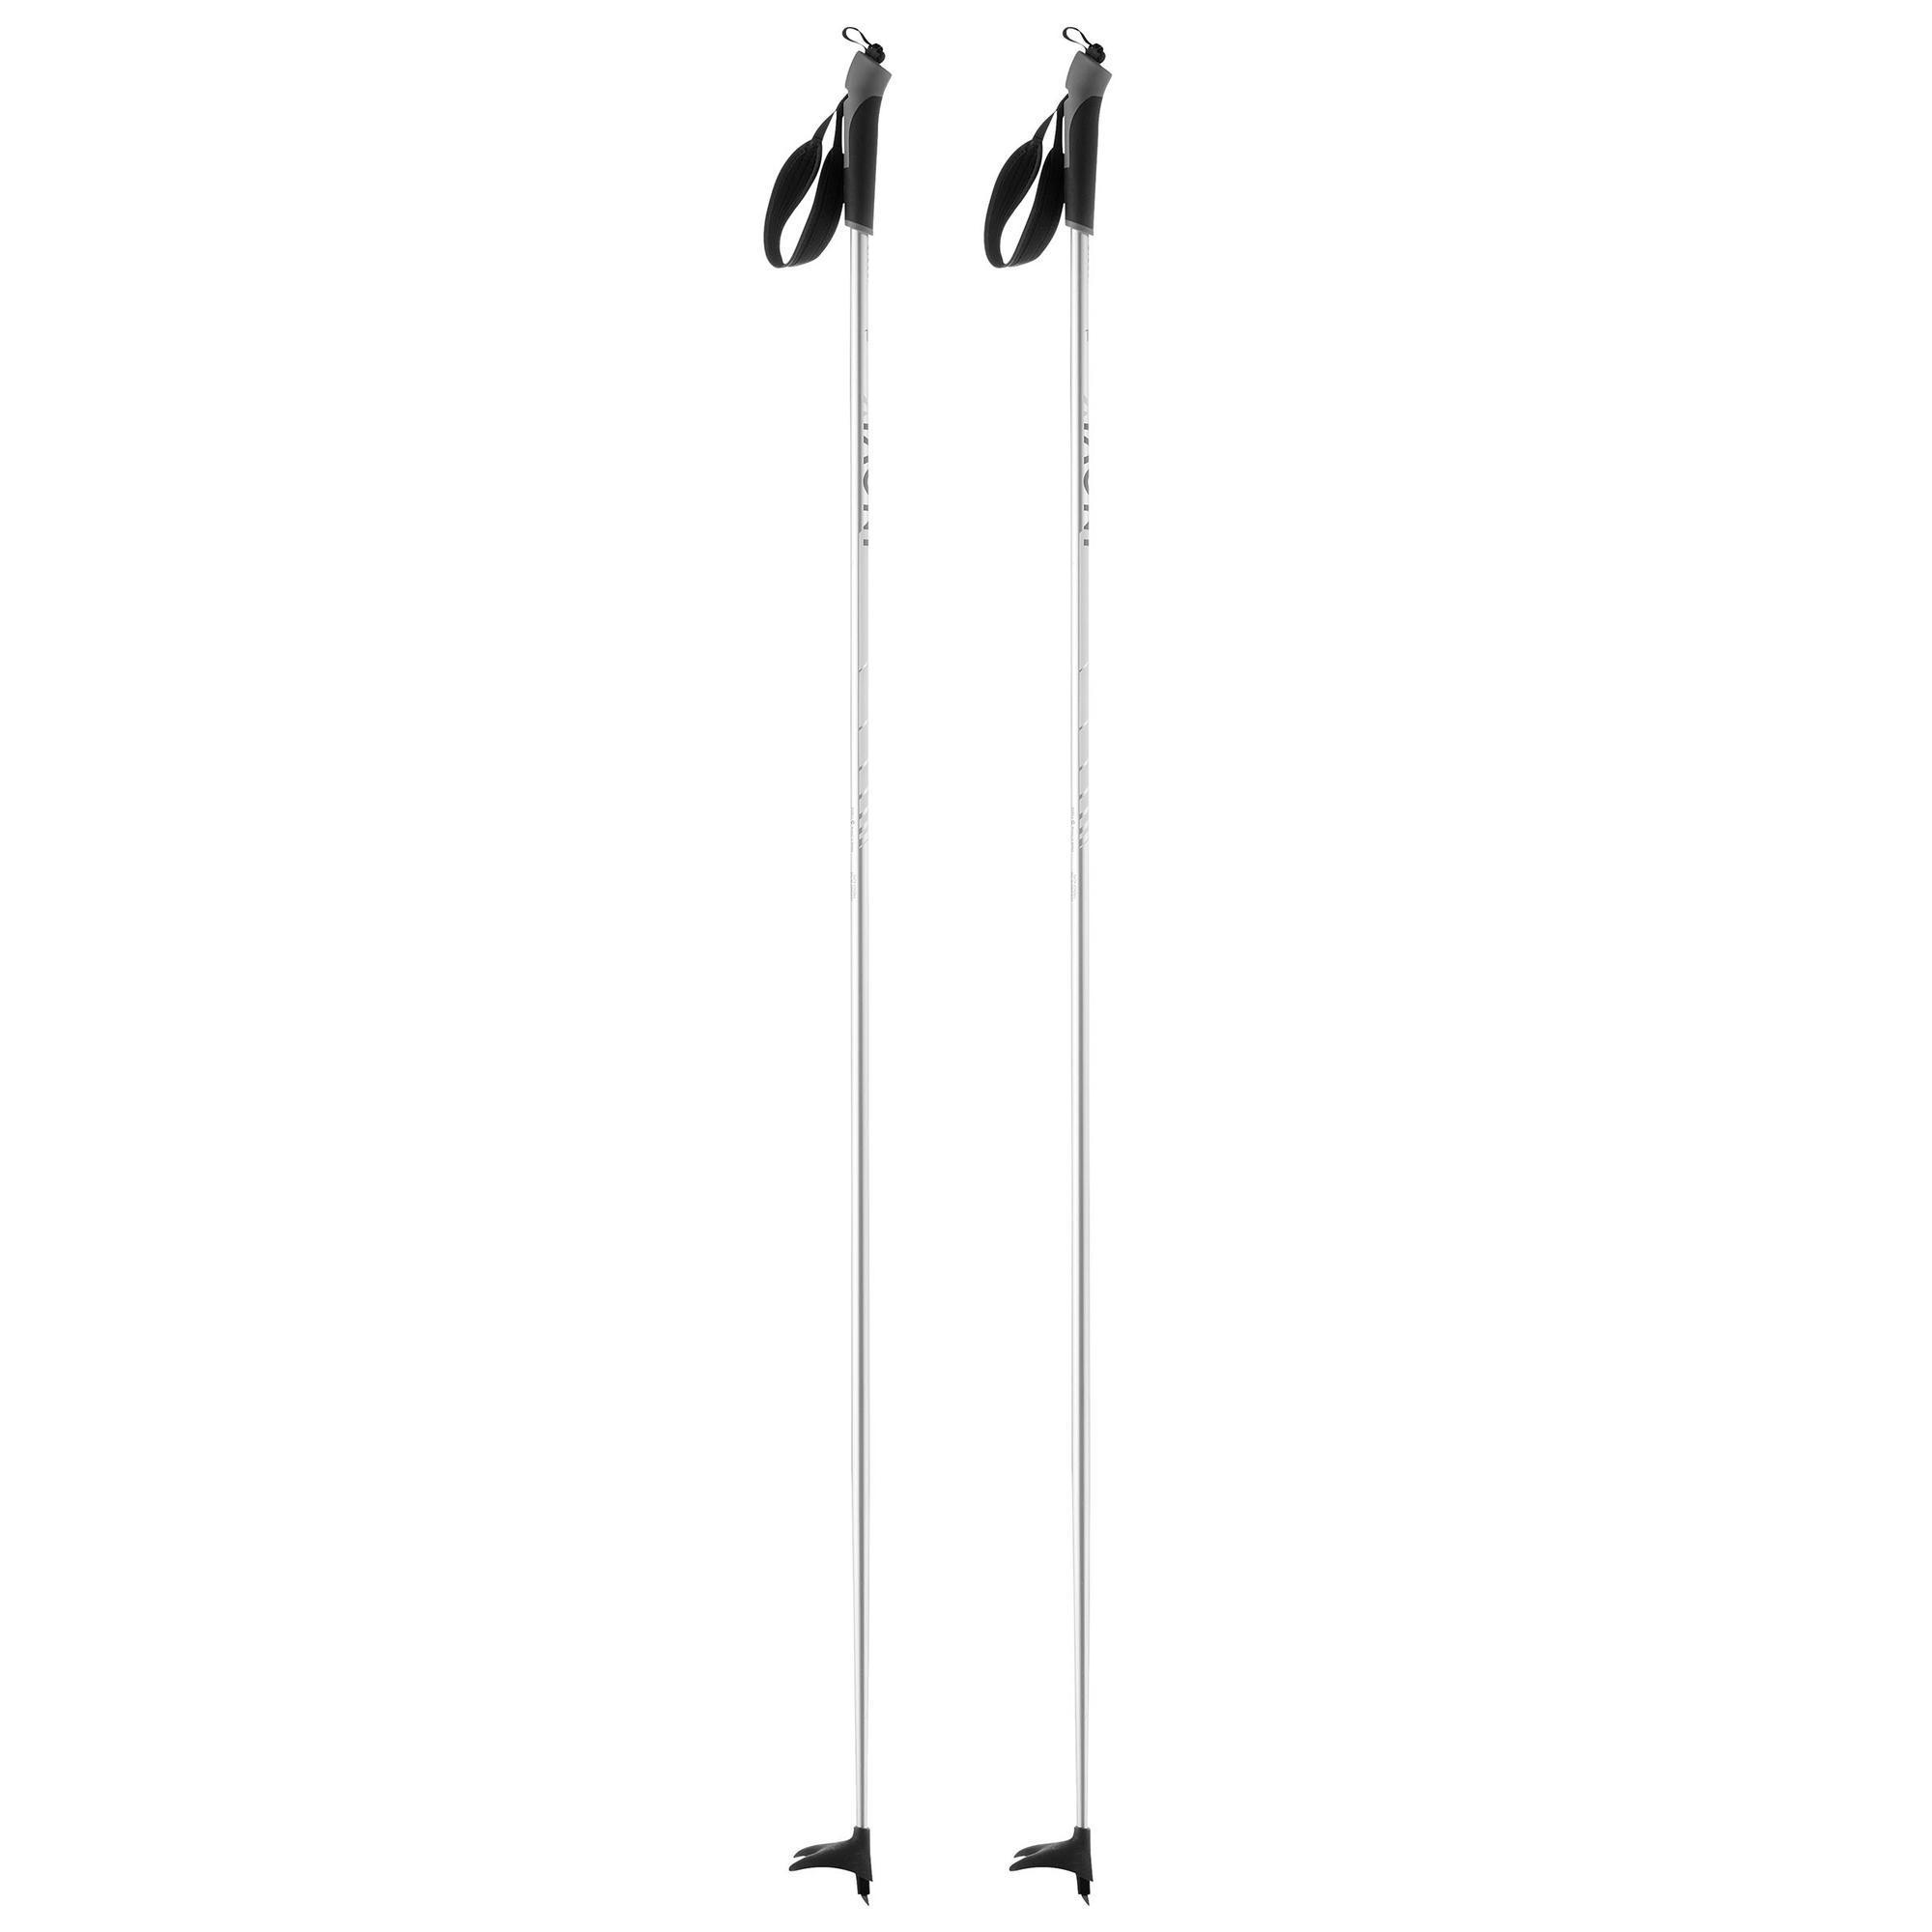 Inovik Langlaufstokken volwassenen XC S POLE 120 thumbnail